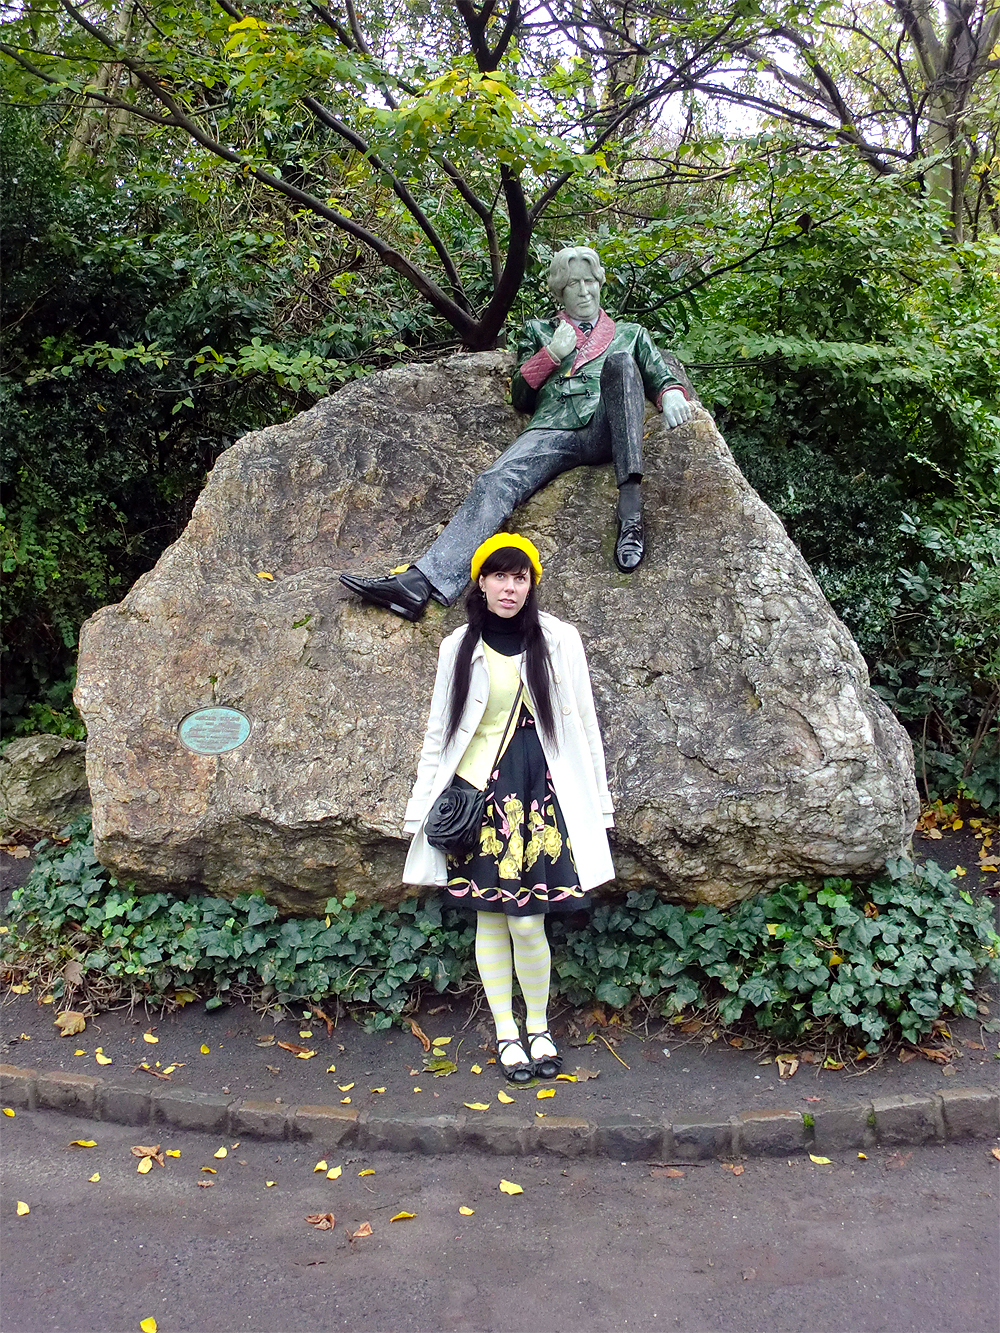 Oscar Wilde Memorial at Merrion Square Park - Dublin, Ireland.